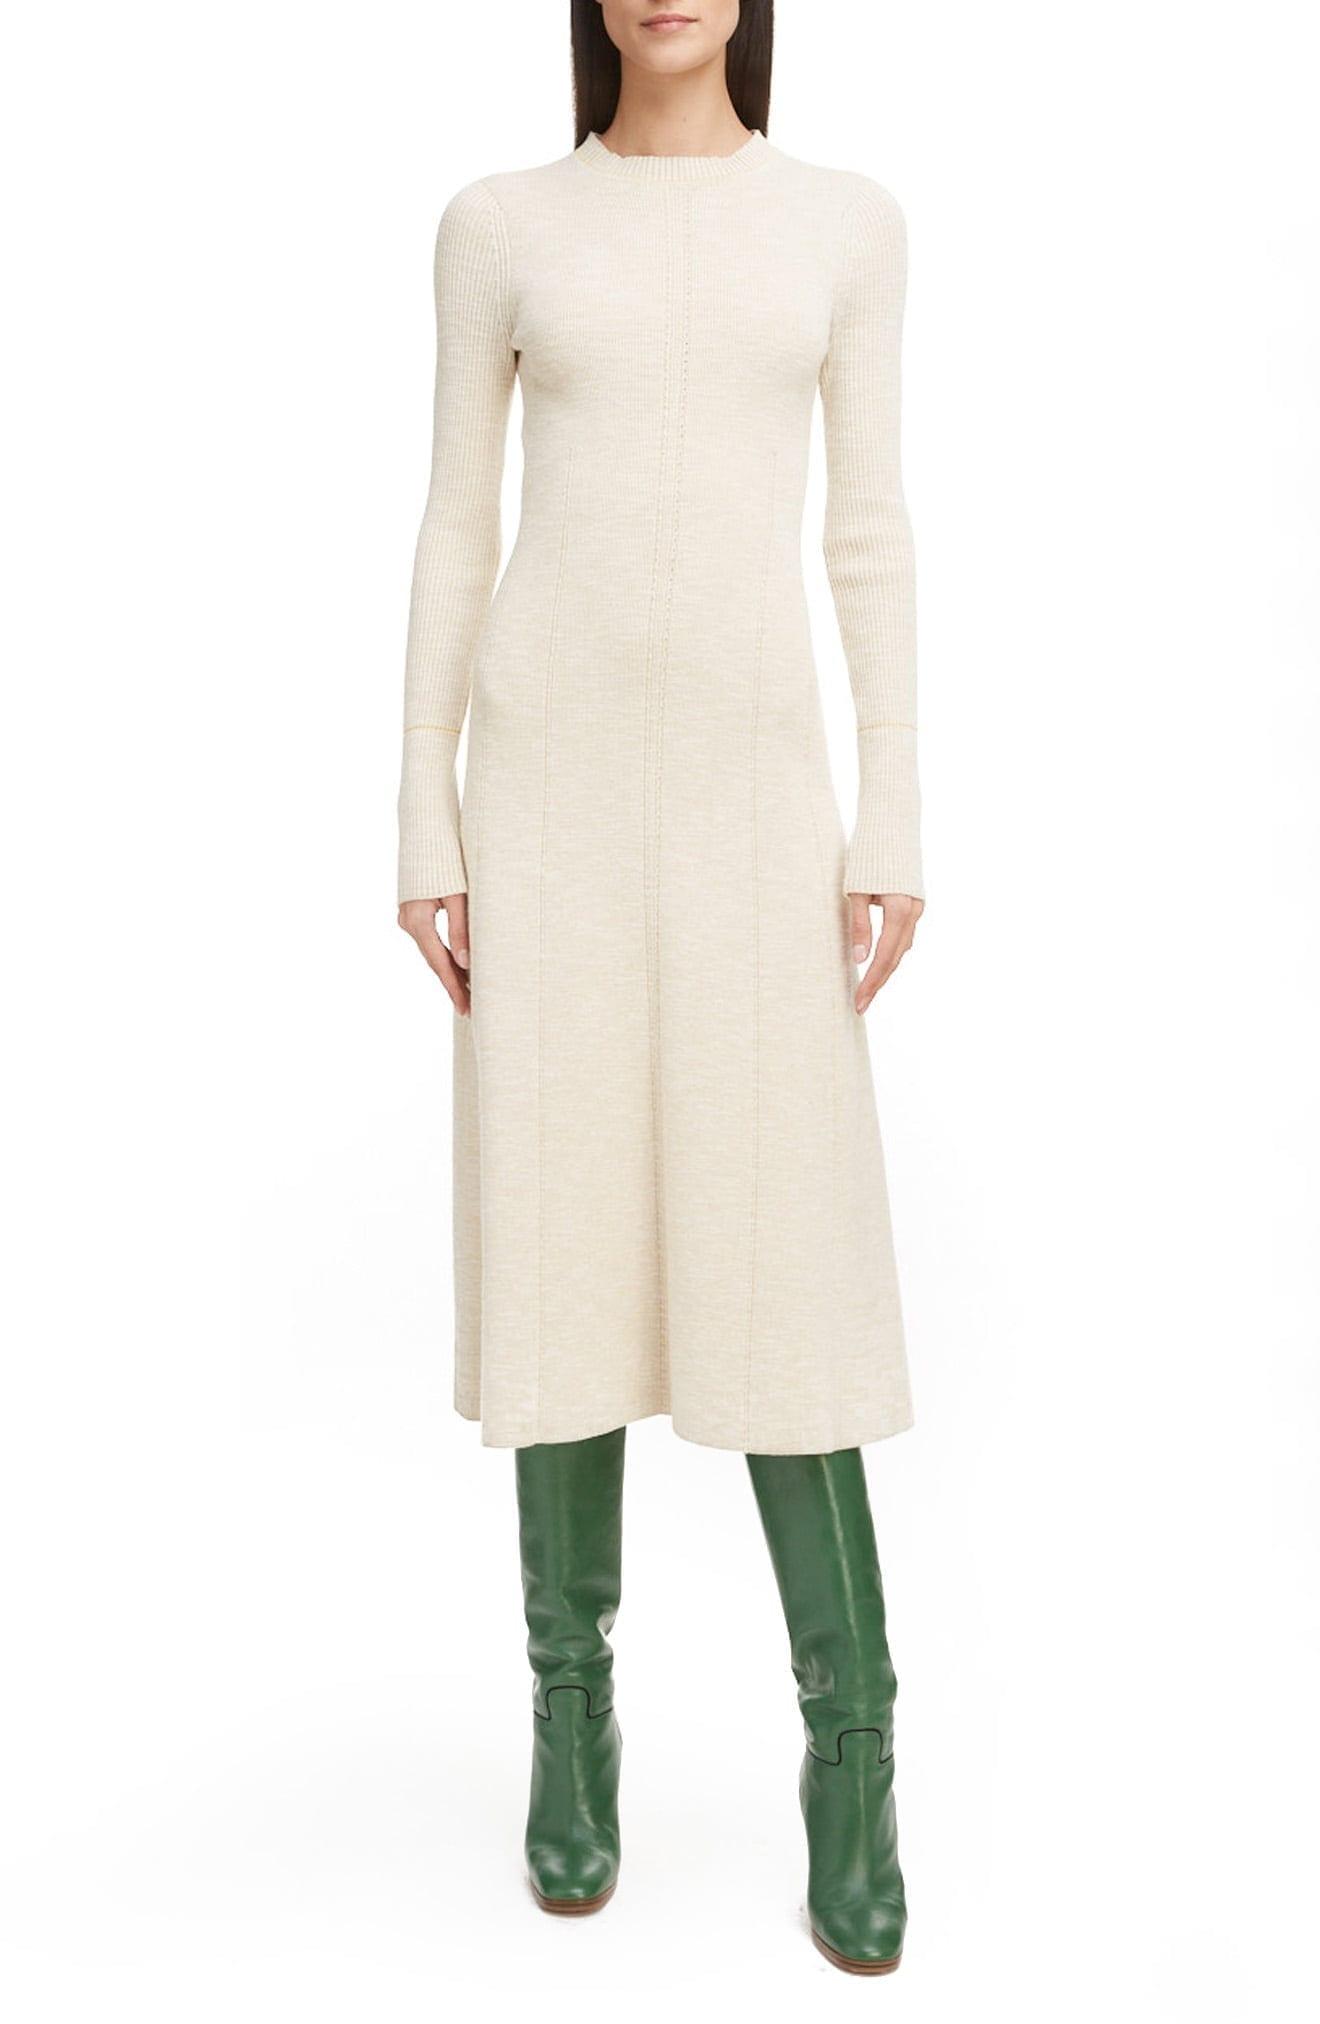 VICTORIA BECKHAM Long Sleeve Fit & Flare Sweater Dress